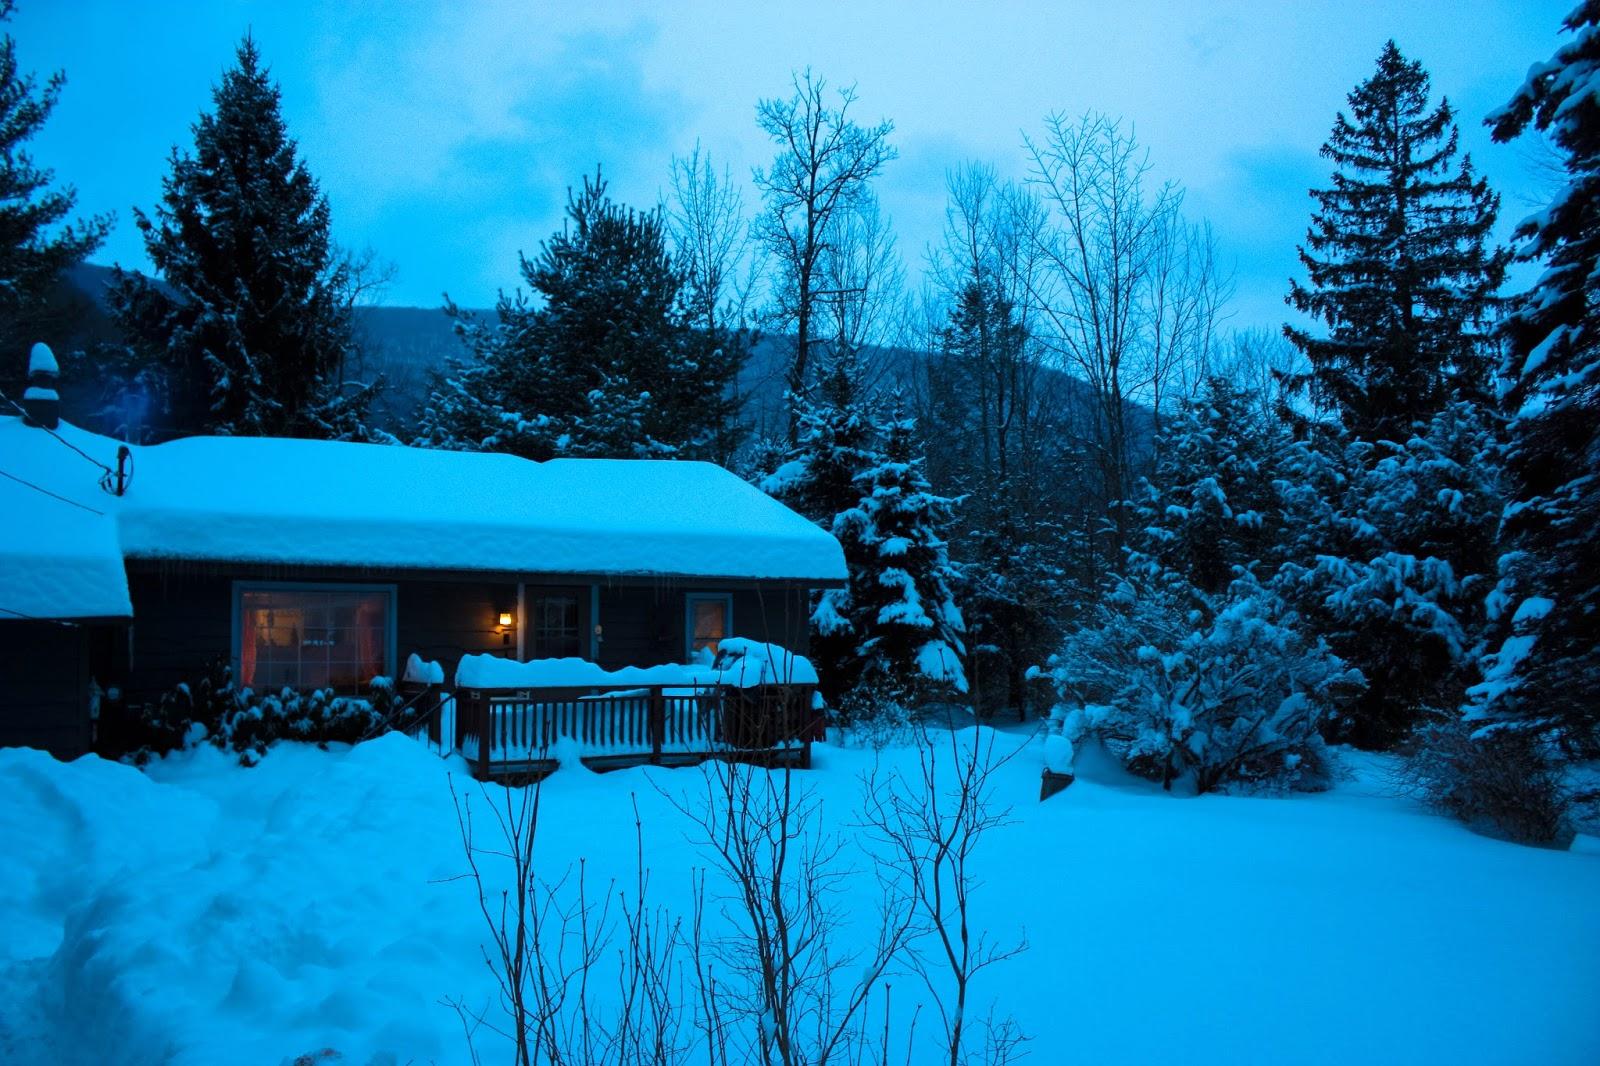 nous 3 new york nuit d 39 angoisse dans la cabin in the wood. Black Bedroom Furniture Sets. Home Design Ideas